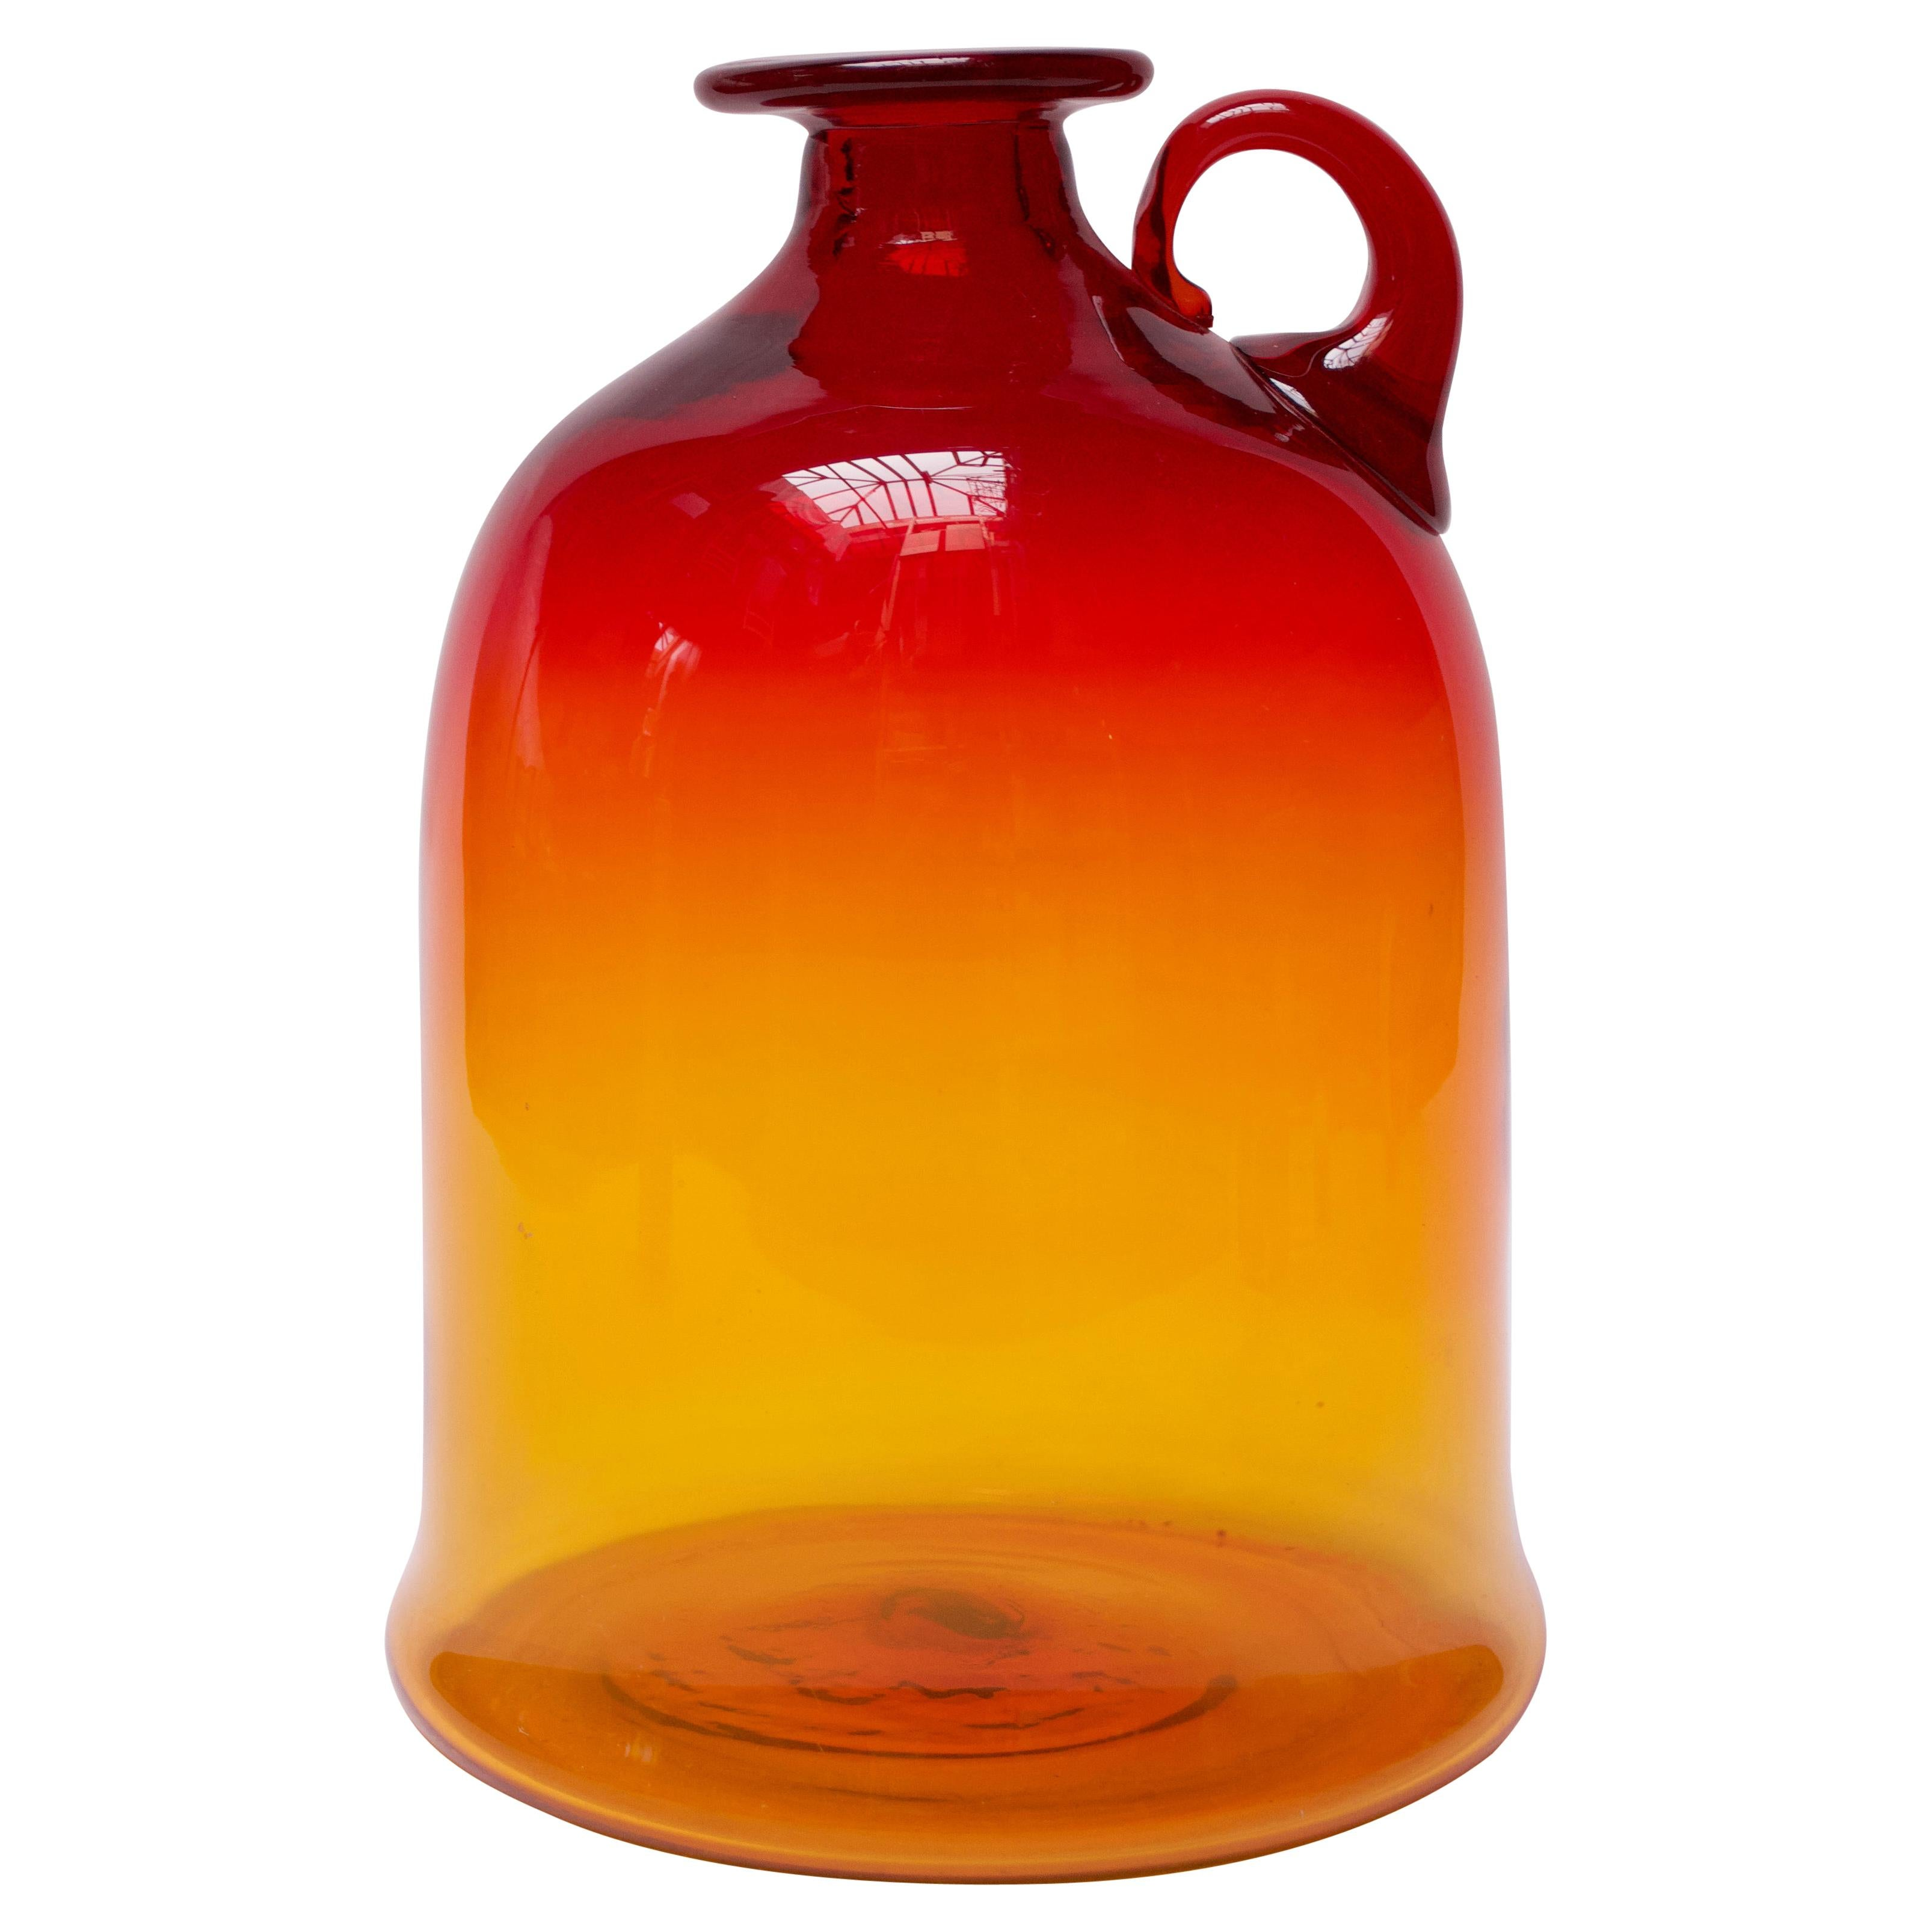 Blown Glass Amberina Tangerine Jug Designed by John Nickerson for Blenko